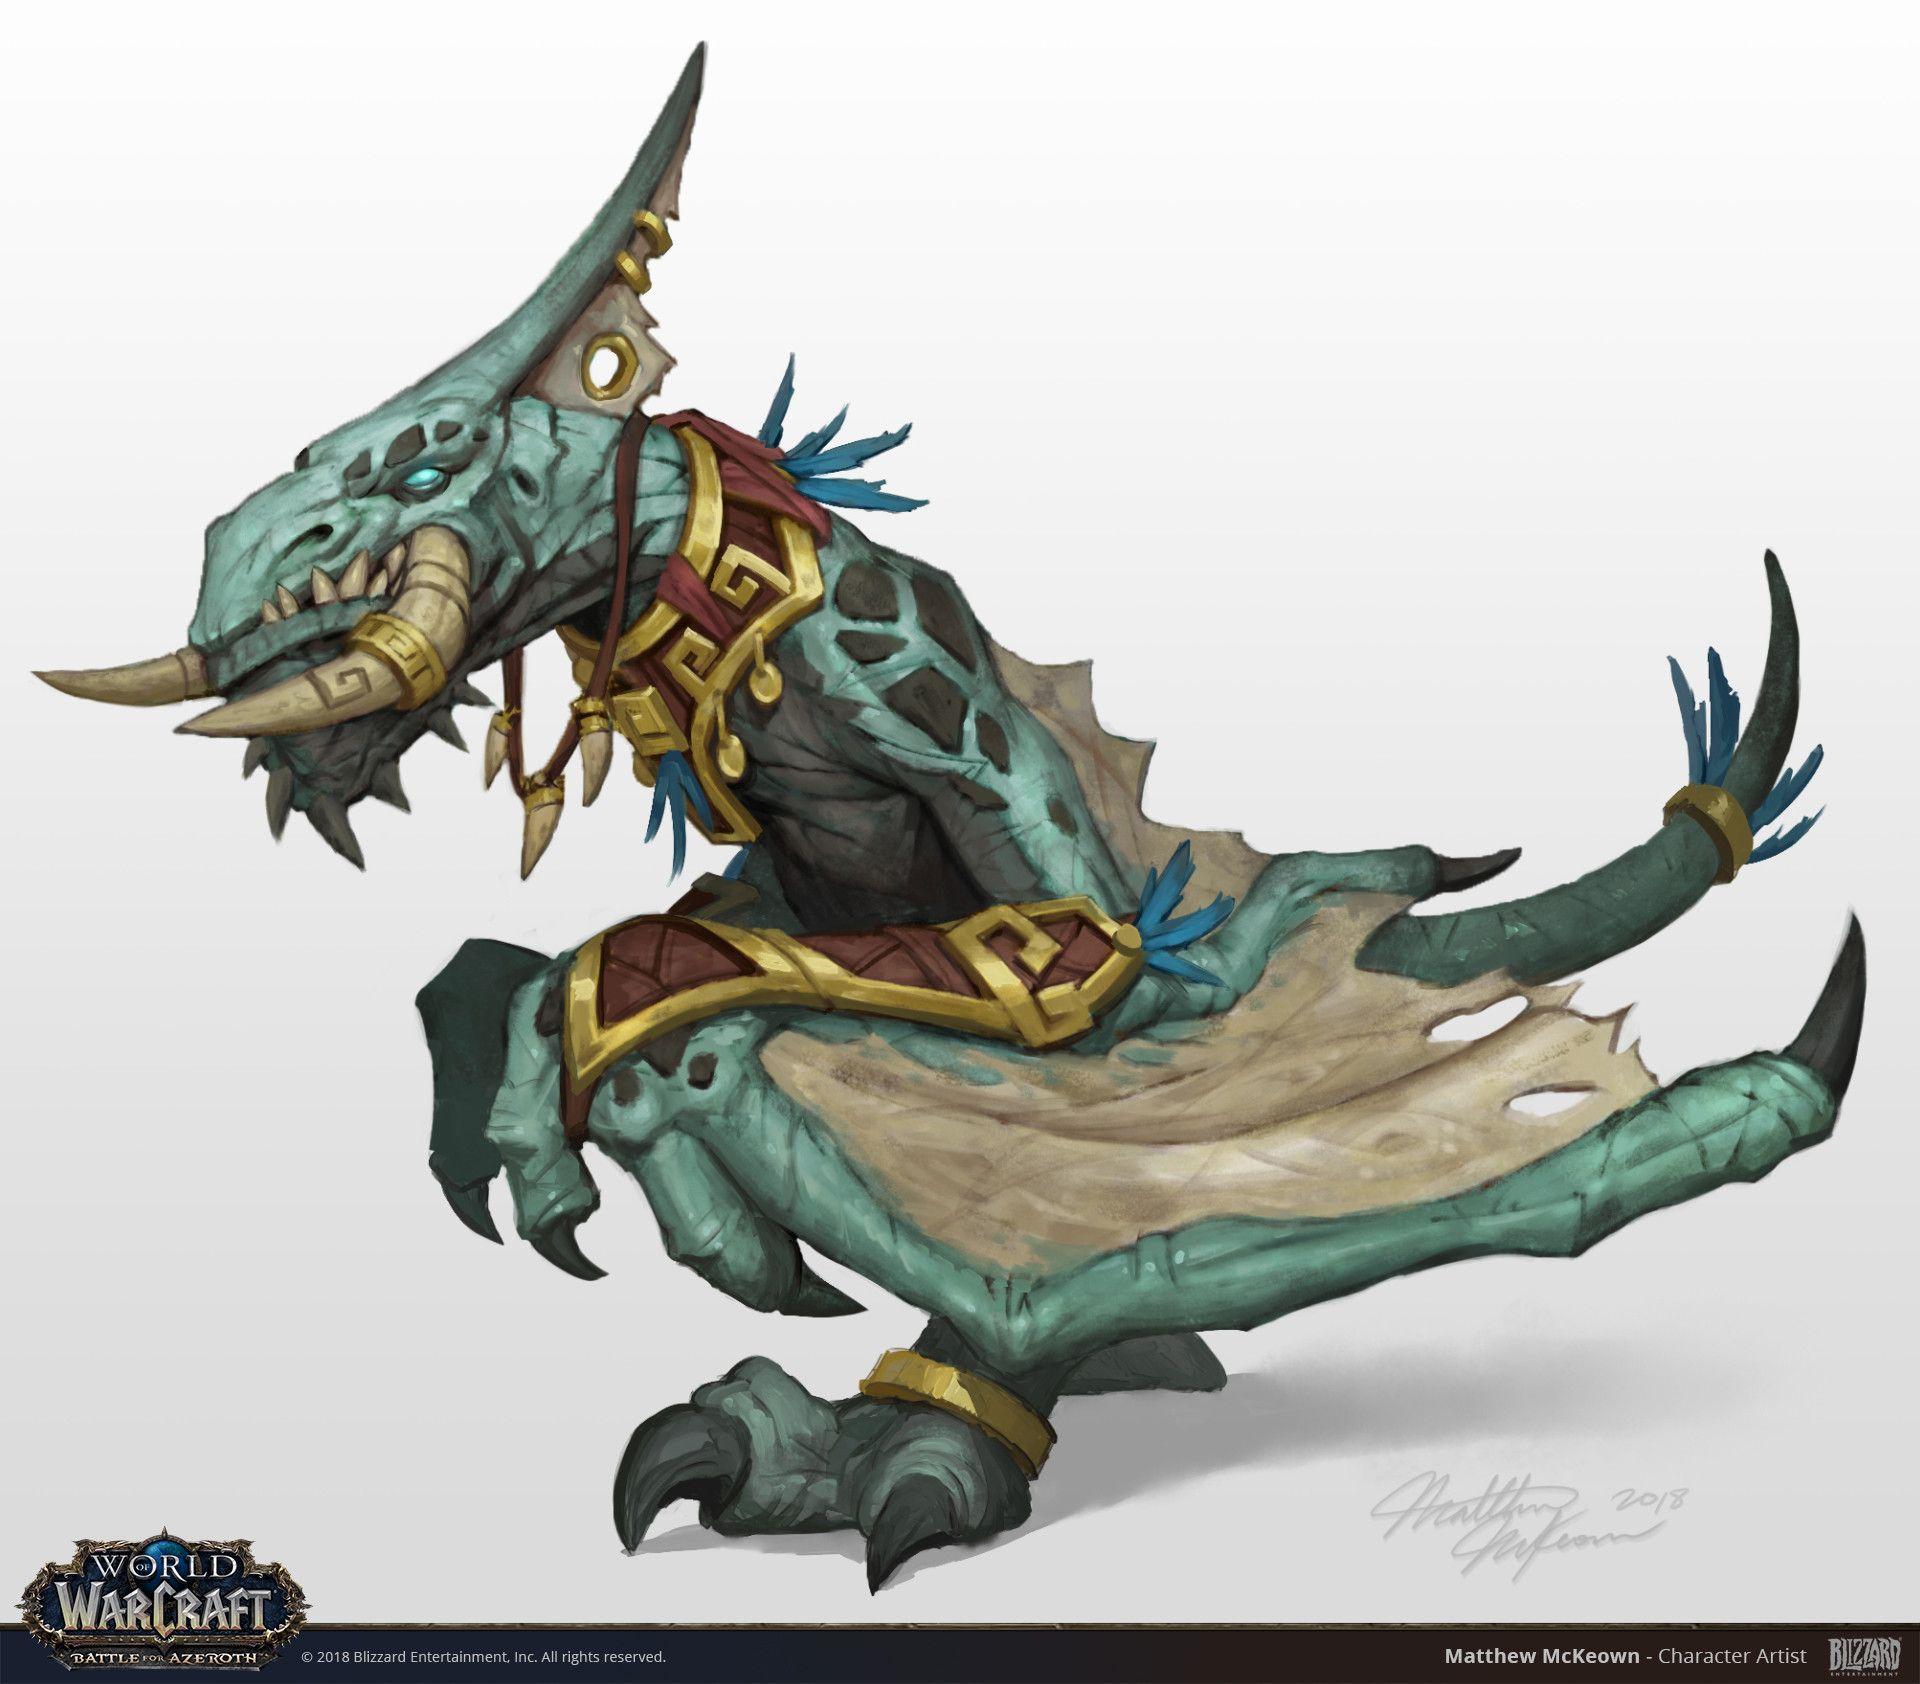 Artstation World Of Warcraft Zandalari Druid Form Concepts Matthew Mckeown World Of Warcraft Monstruos Criatura